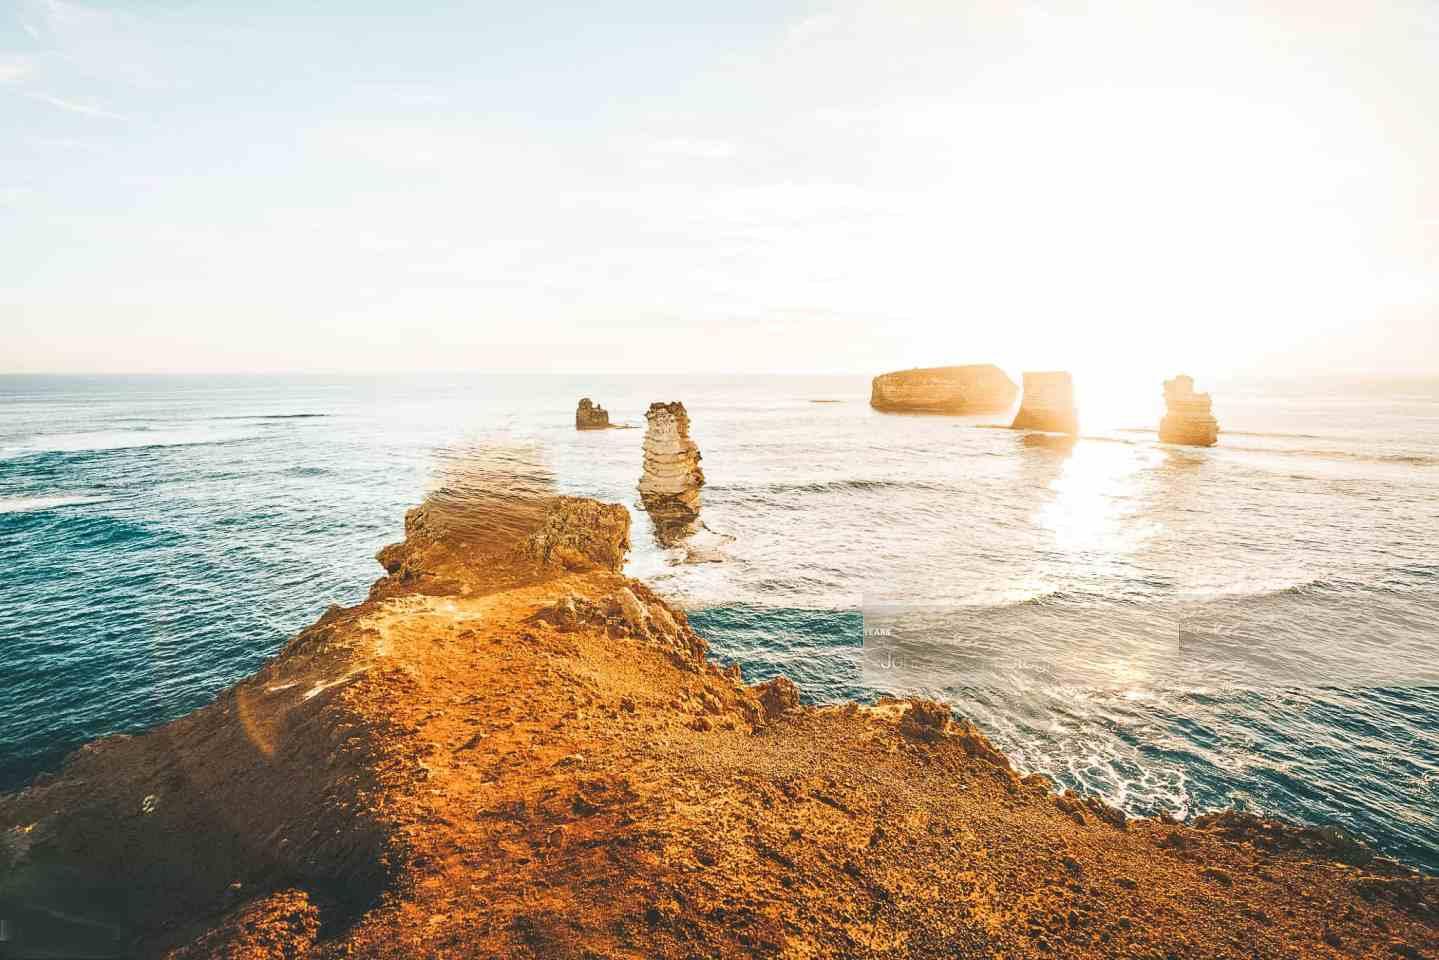 Coastal view onto rocks in the ocean.